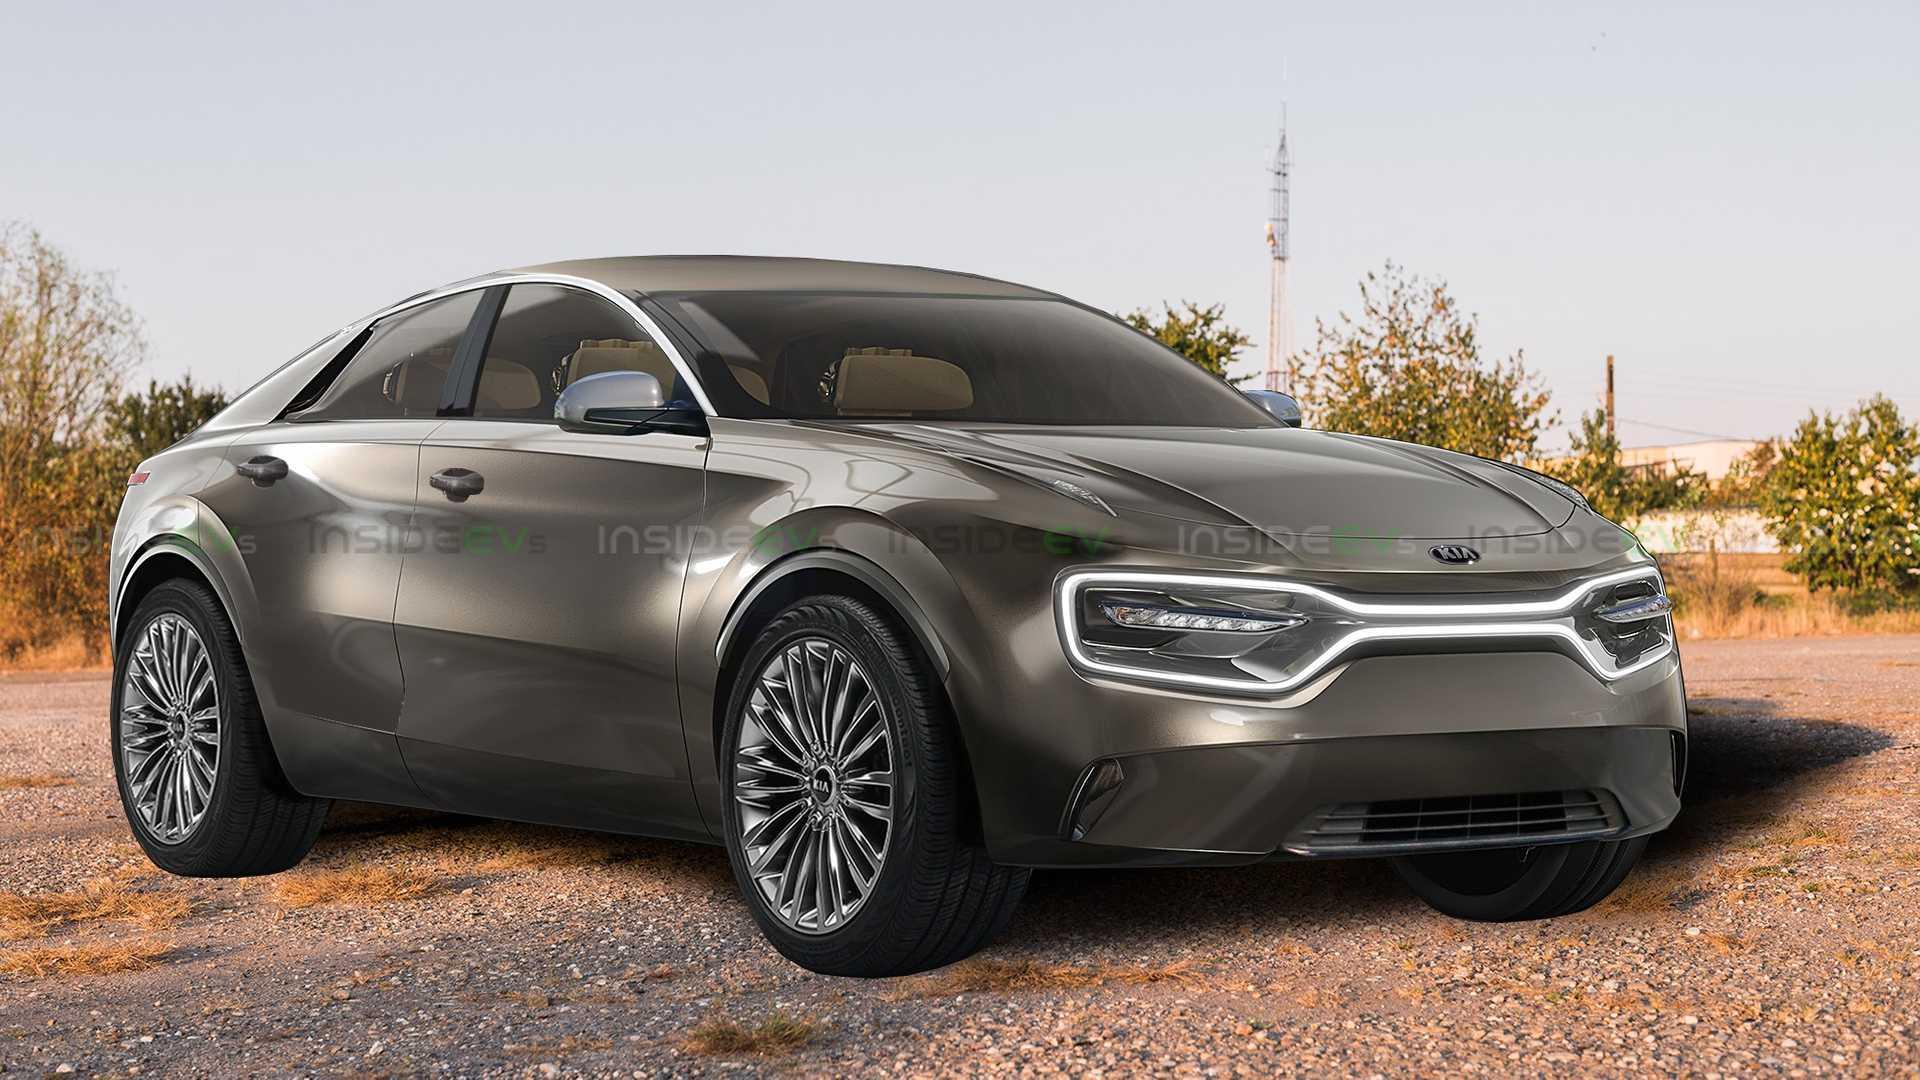 У кроссовера Kia Electric 2021 будет ускорение в стиле суперкара